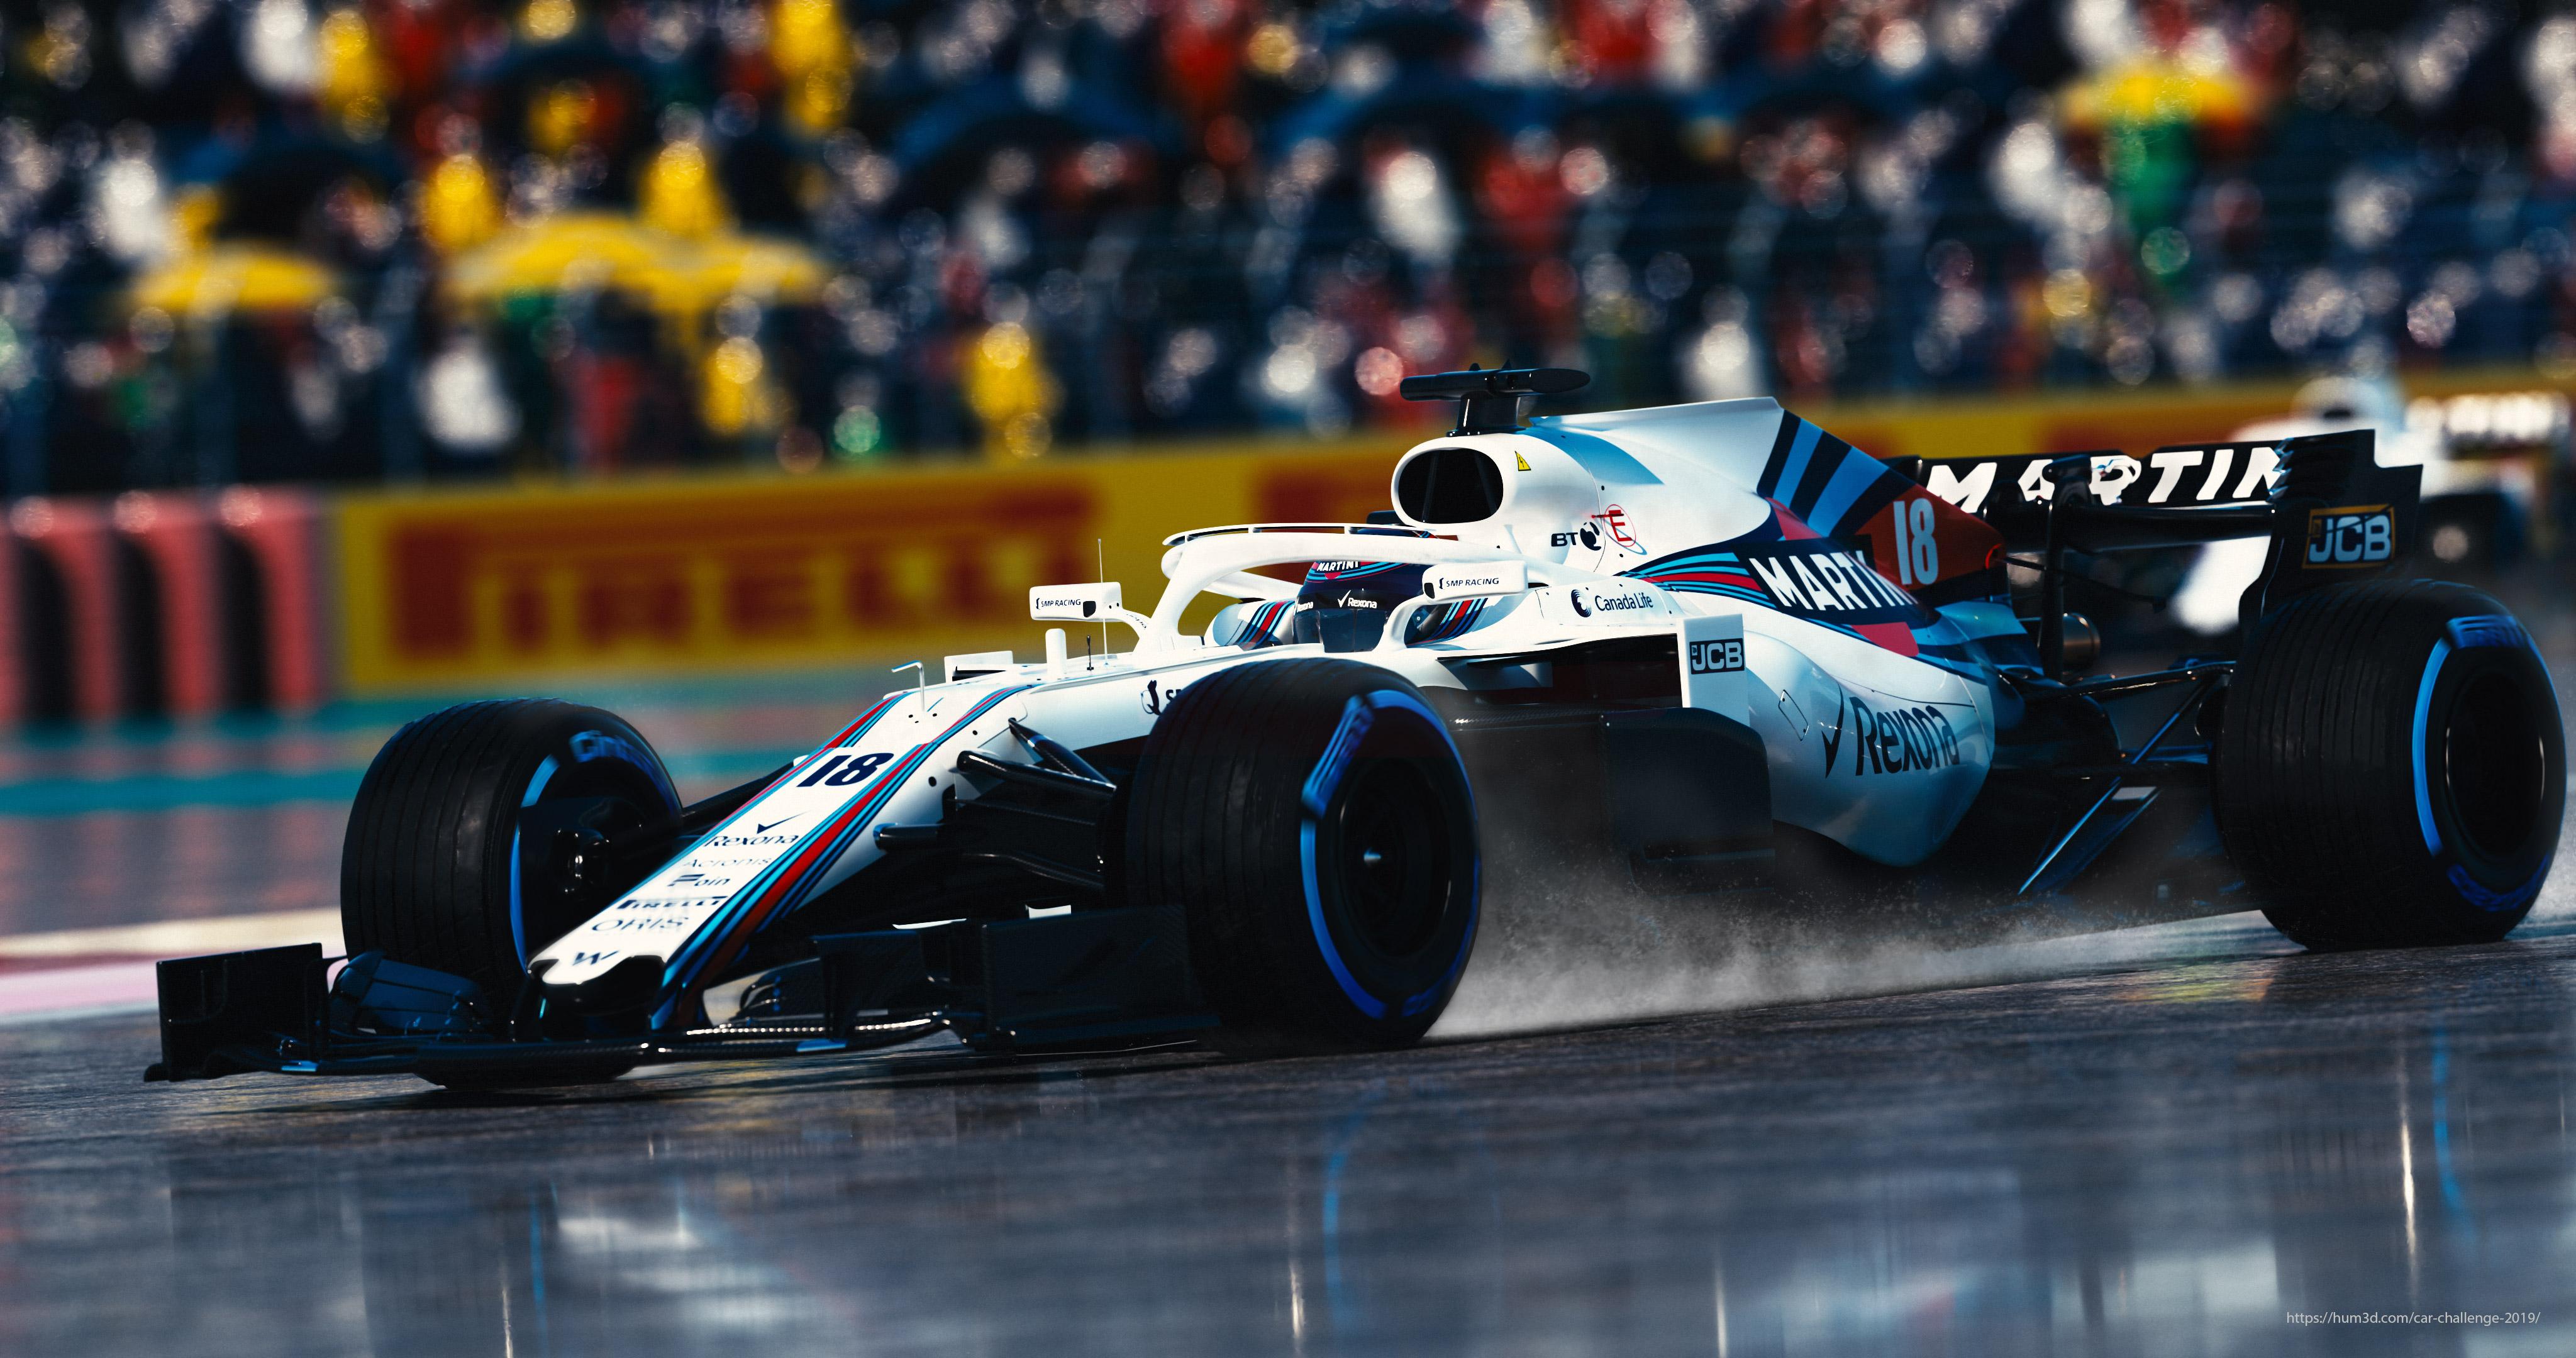 Williams FW41 car render challenge 2019